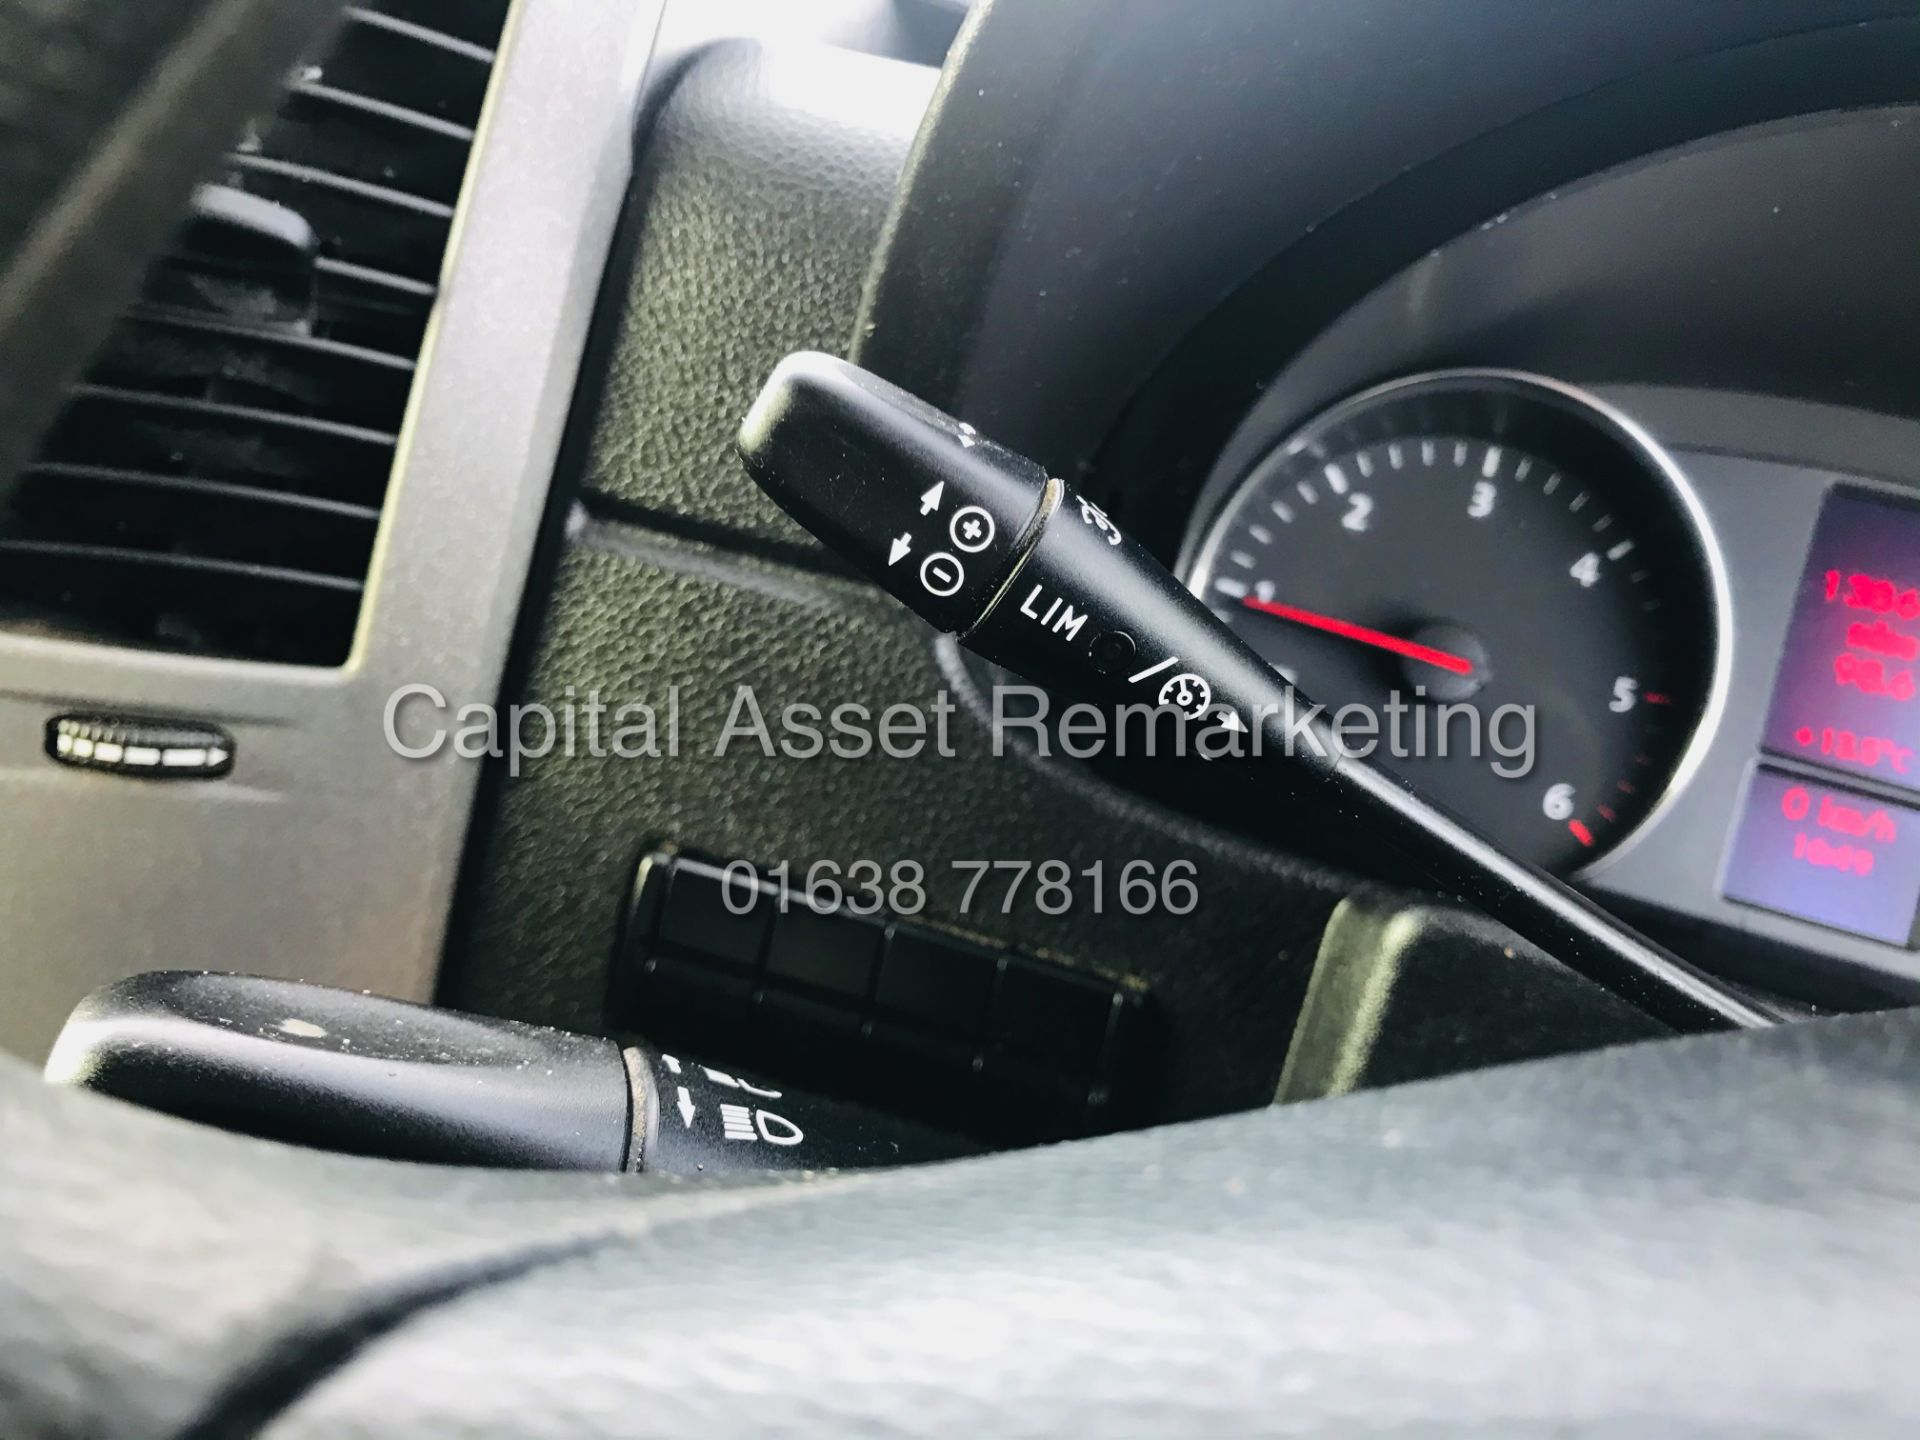 ON SALE VW CRAFTER 2.0TDI CR35 (15 REG) 1 OWNER - CRUISE - ELEC PACK - MULTIFUNCTION STEERING WHEEL - Image 17 of 19